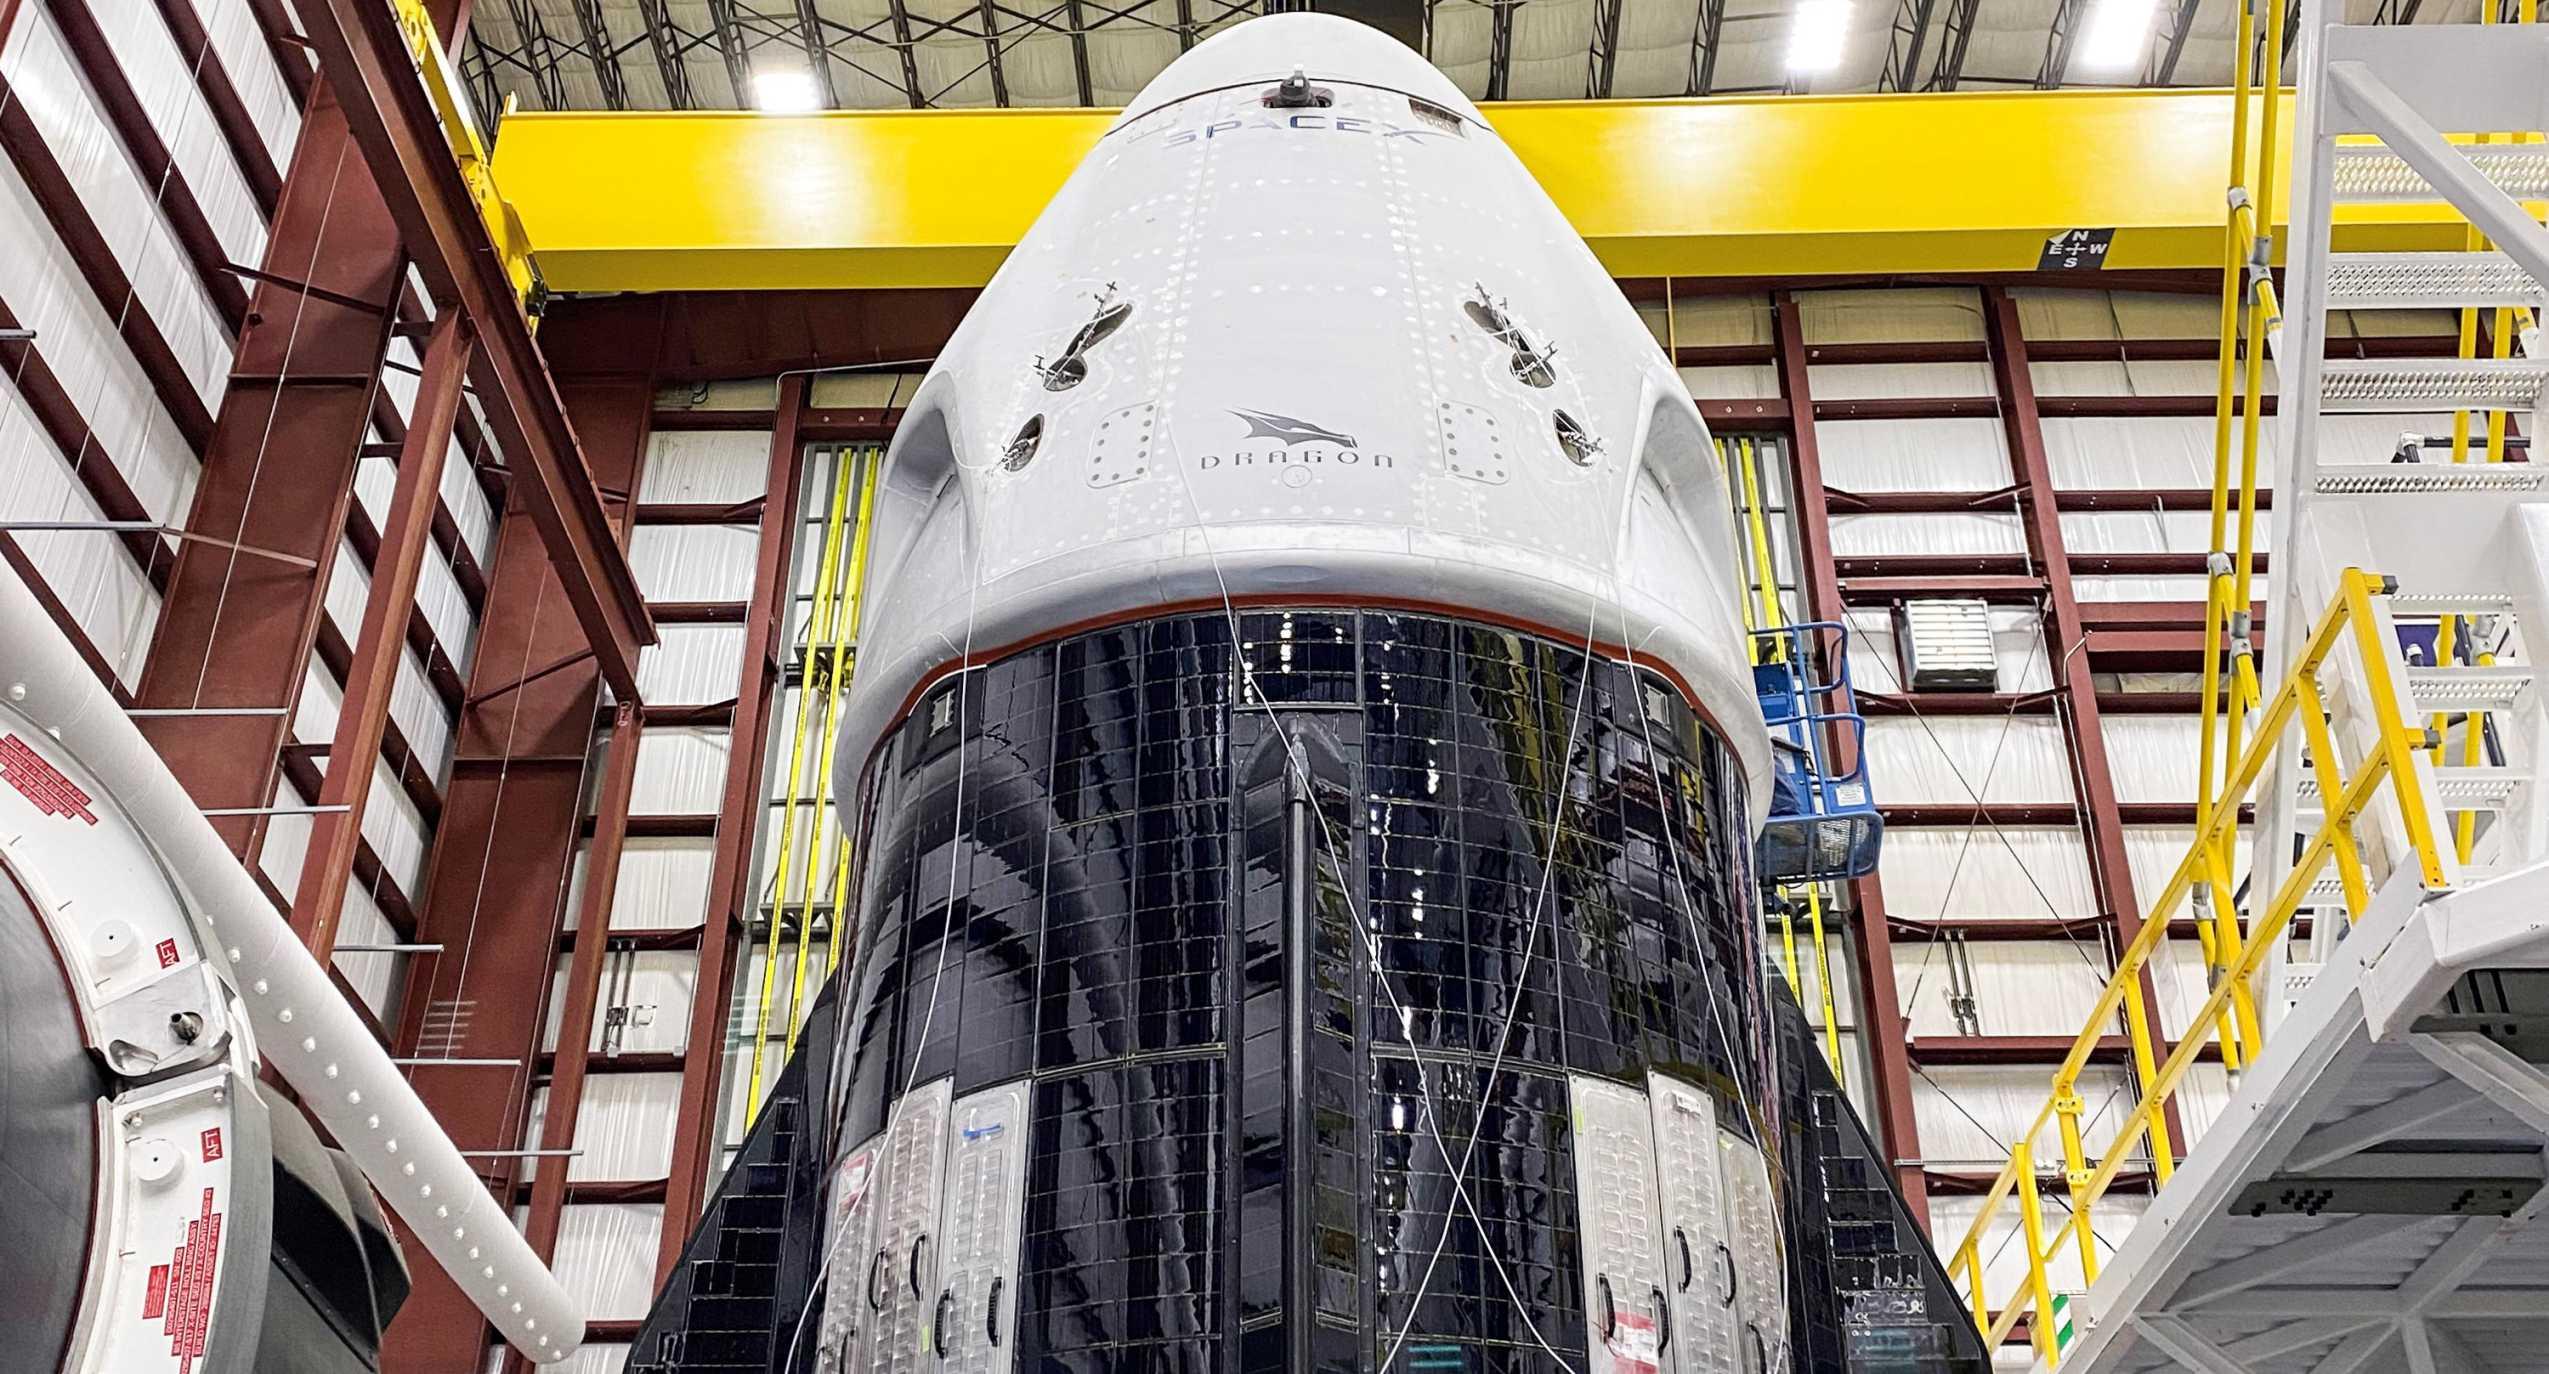 Demo-2 Crew Dragon C206 + trunk 39A 052020 (SpaceX) 1 crop (c)